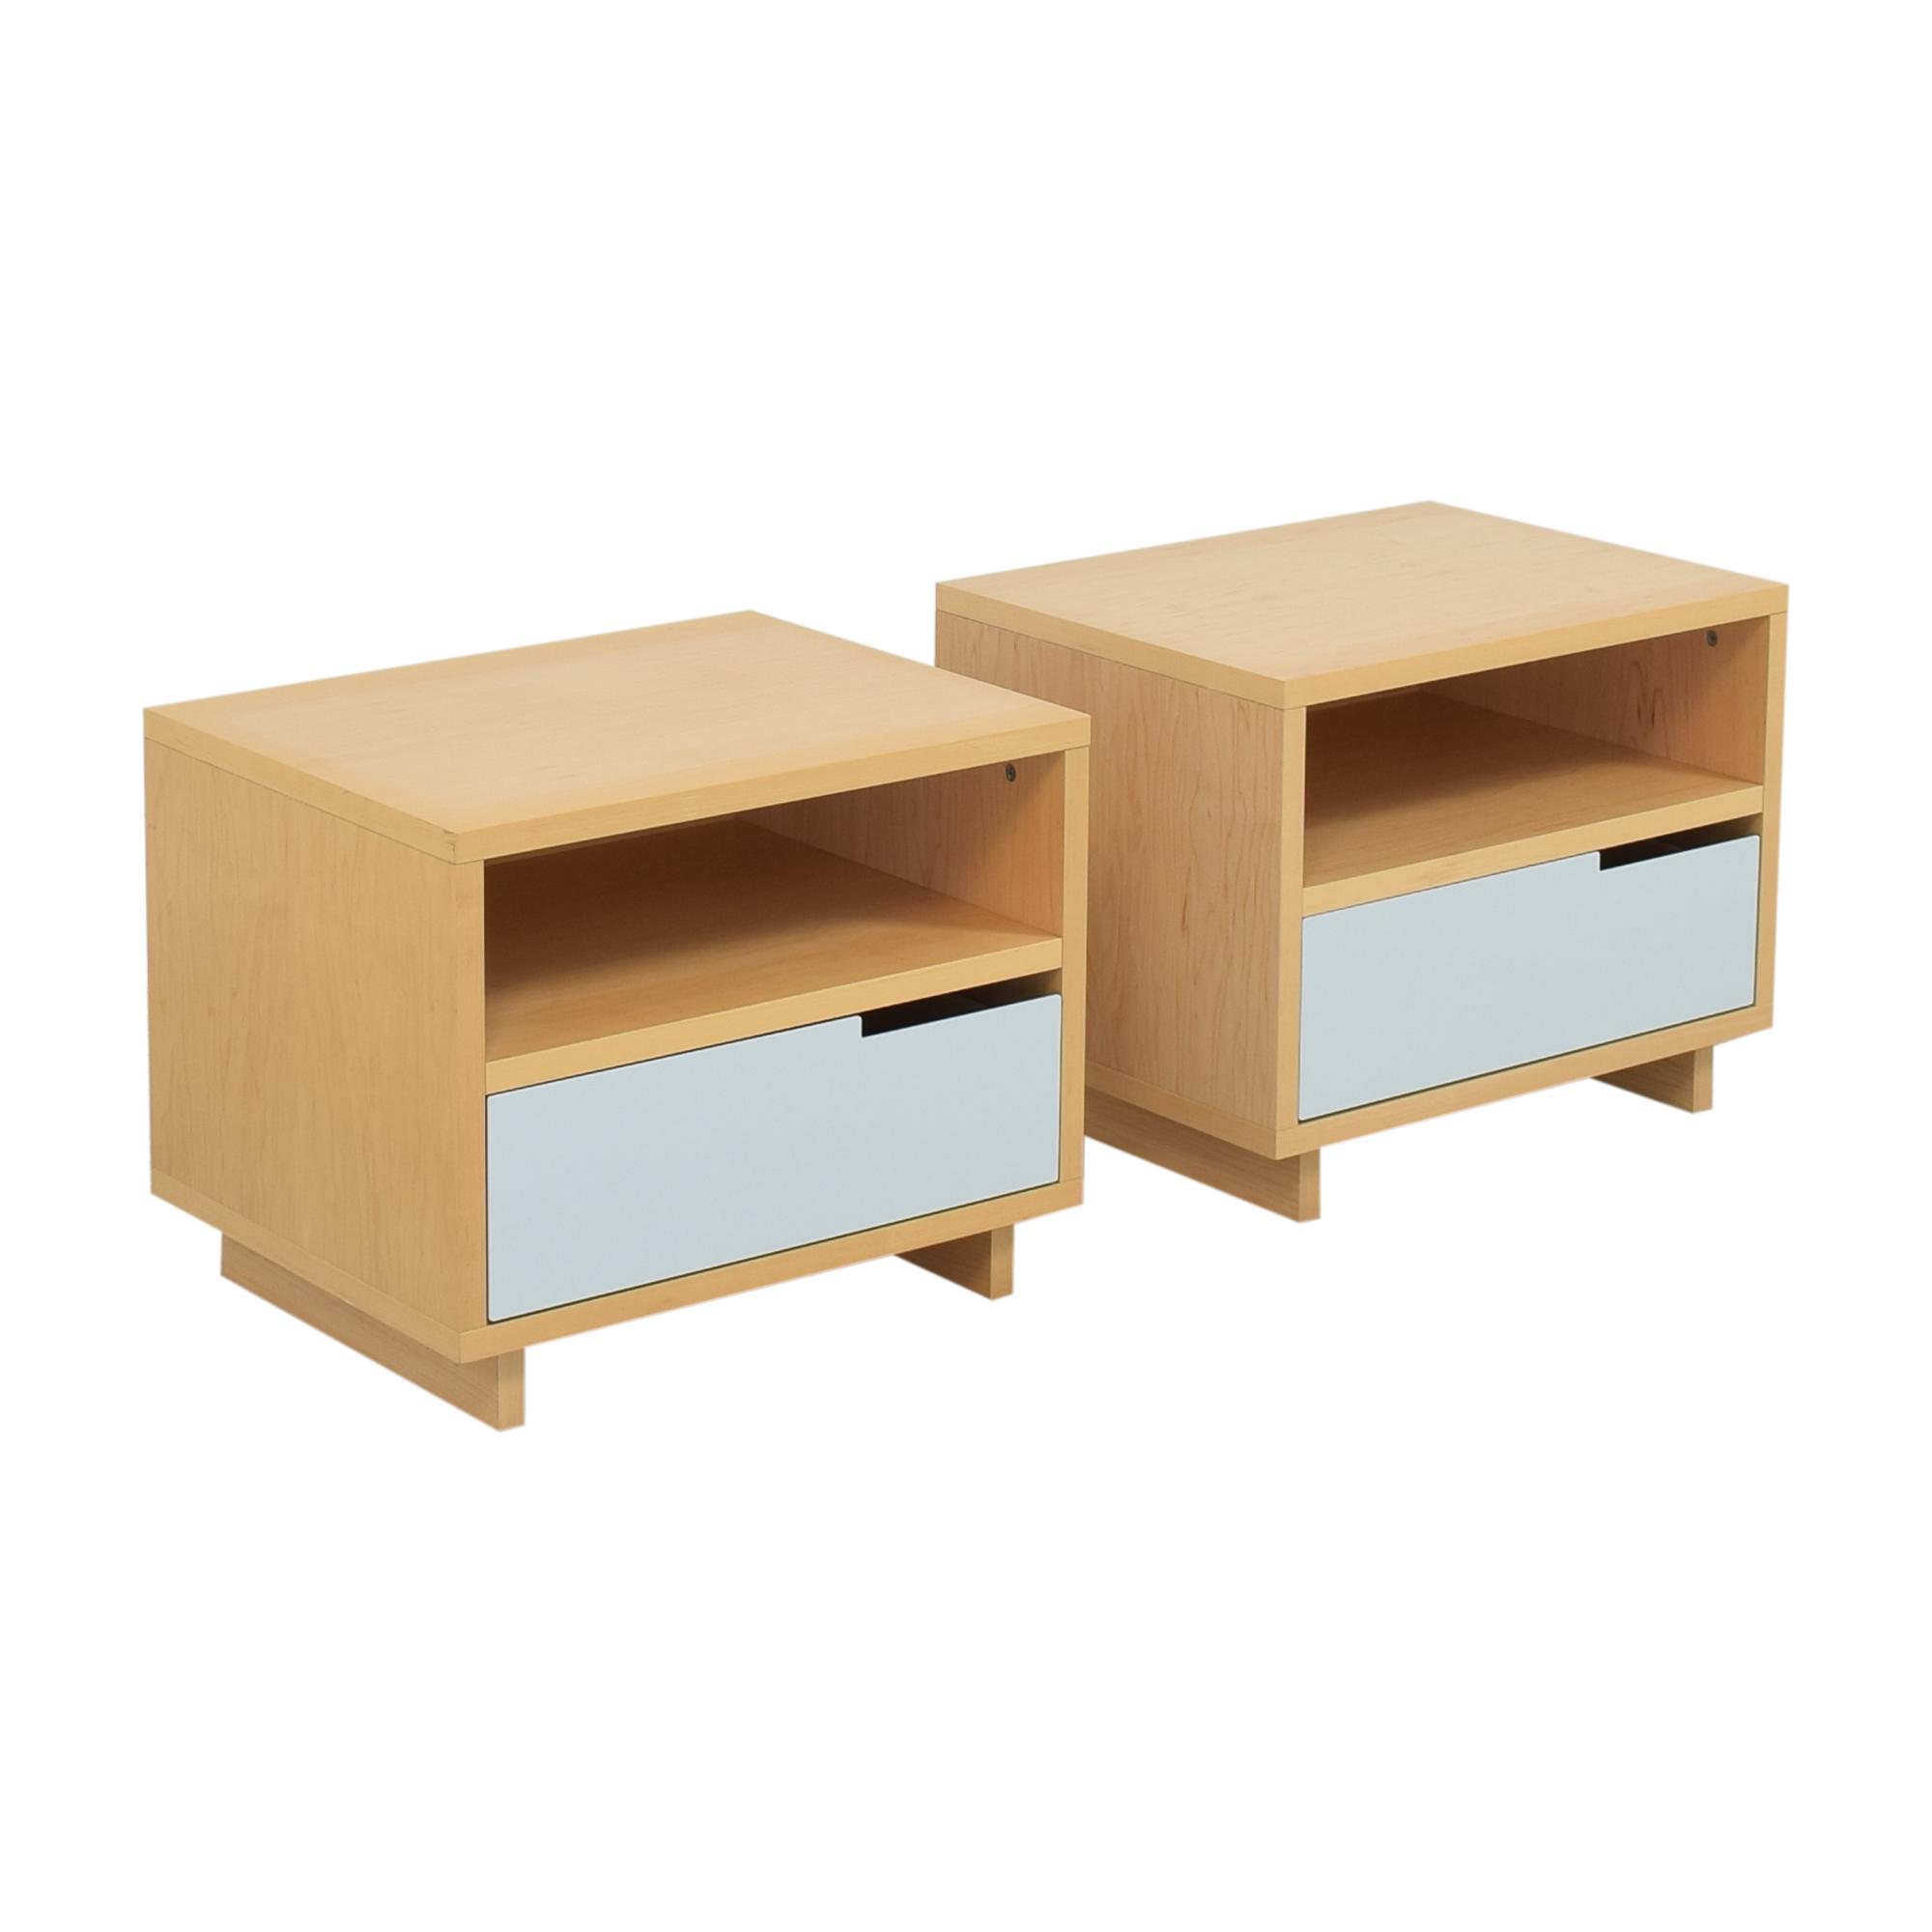 Blu Dot Blu Dot Modu-licious Bedside Tables Tables